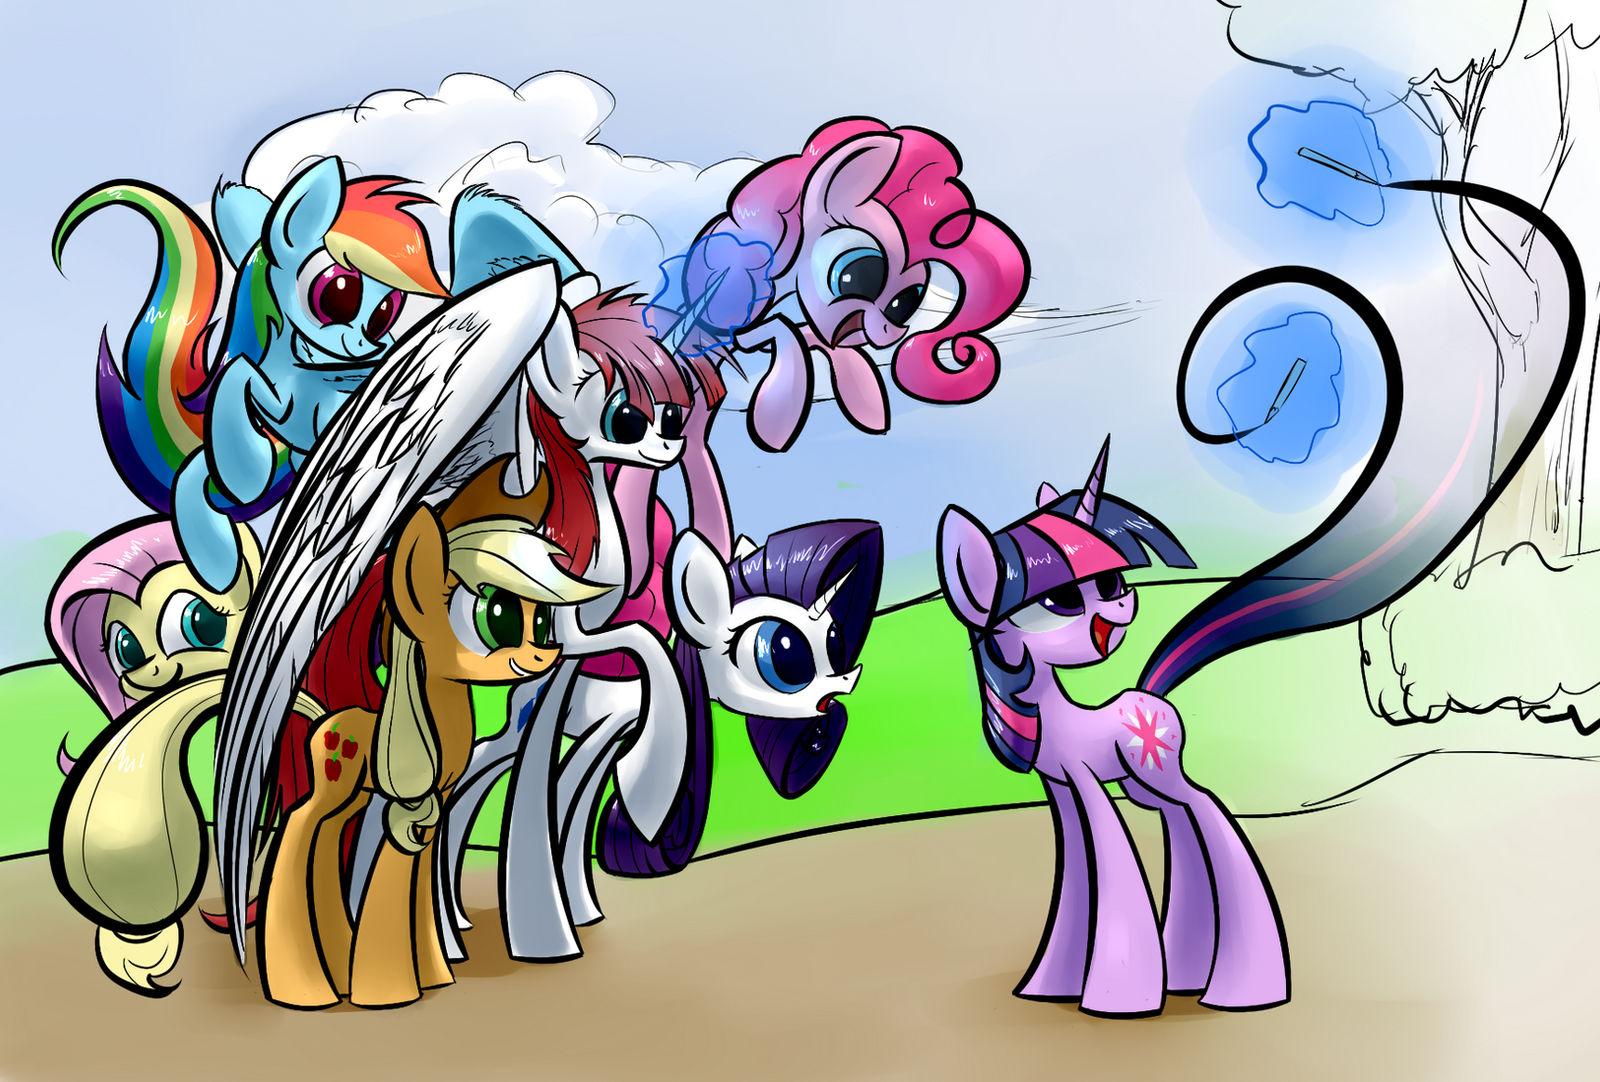 Let's Make Some Ponies